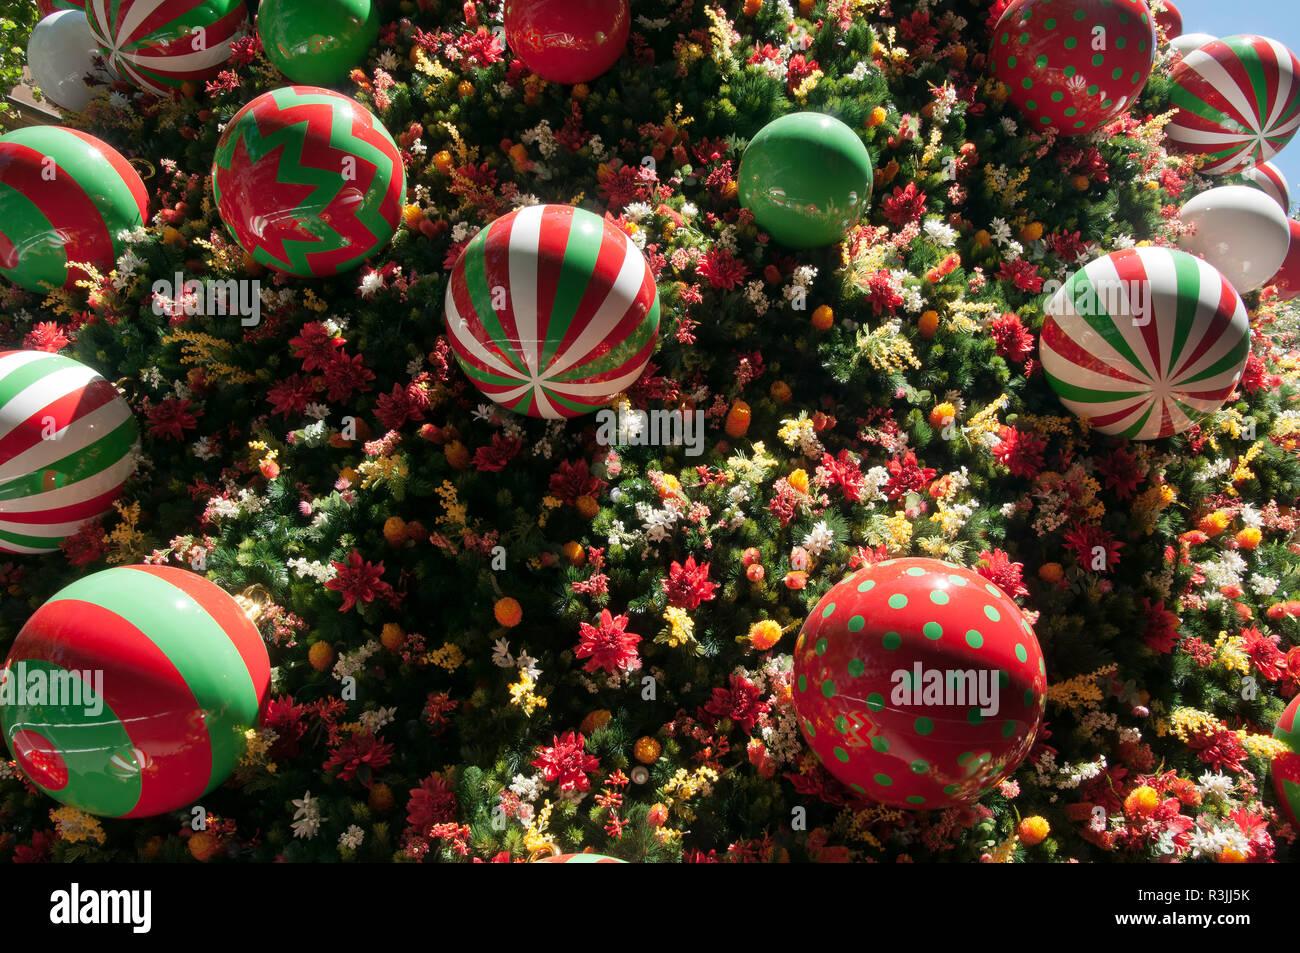 Sydney Australia Close Up Of Christmas Tree Decorations In Martin Place Stock Photo Alamy